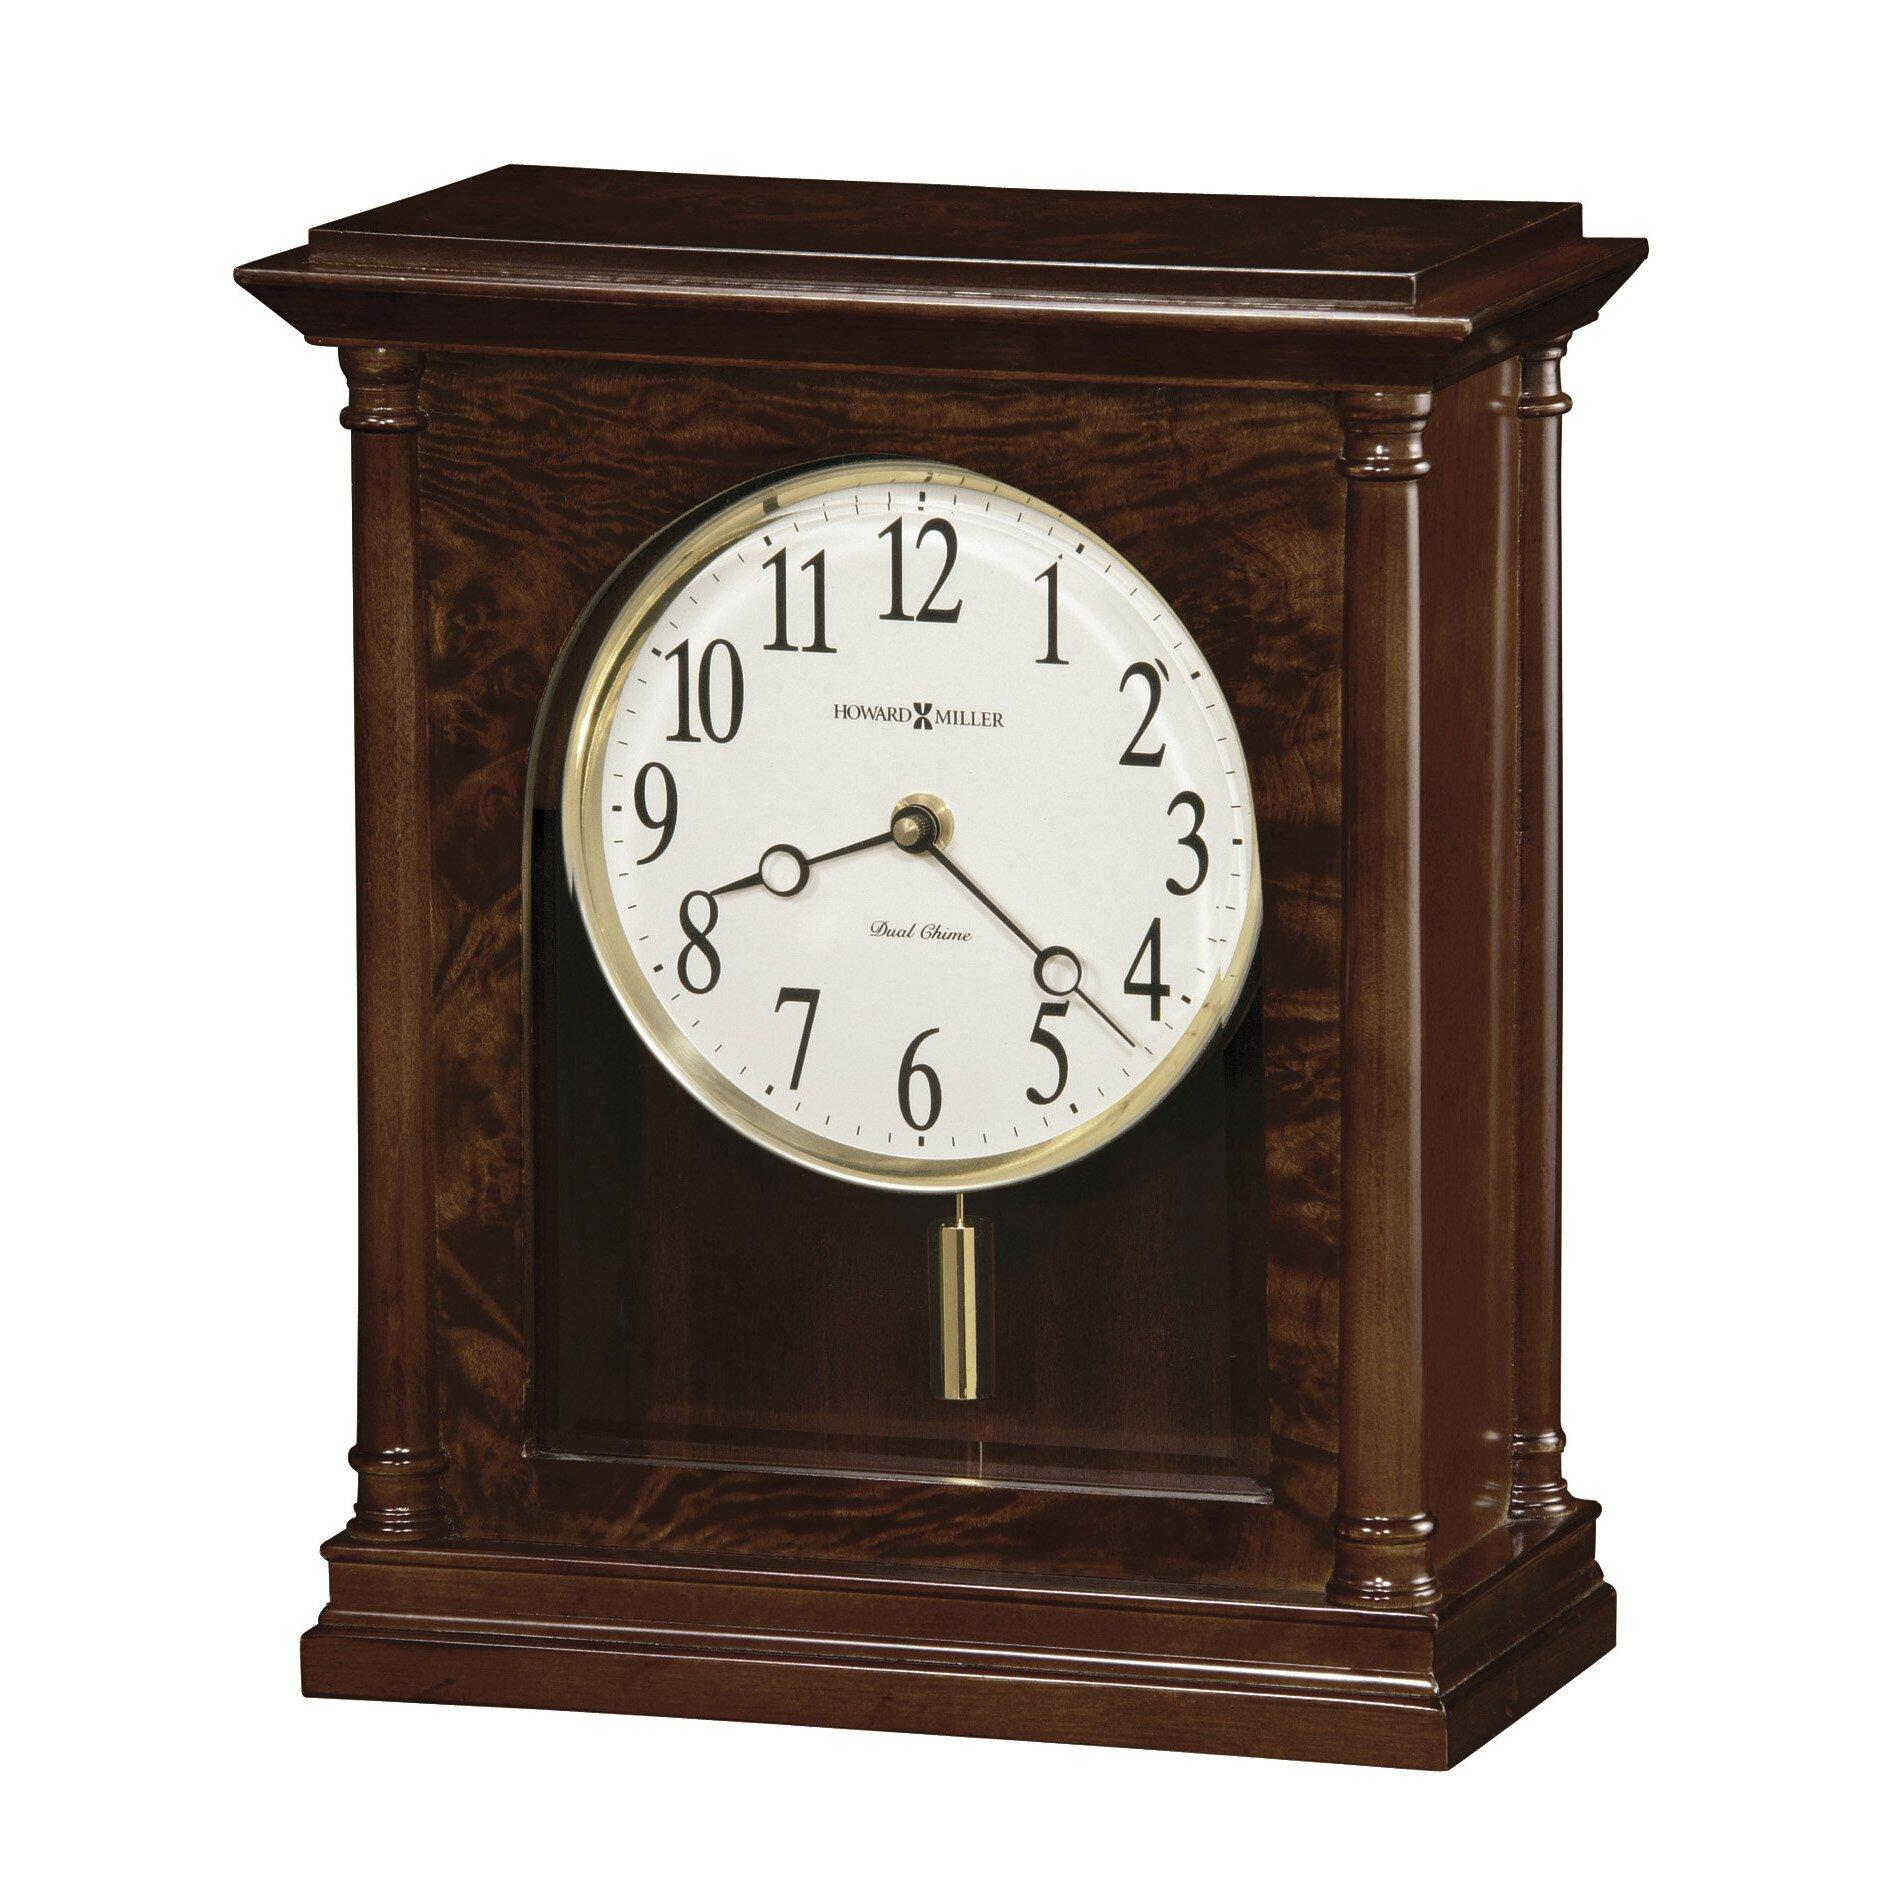 California King Size Bedroom Furniture Sets Howard Miller Candice Chiming Quartz Mantel Clock Wayfair